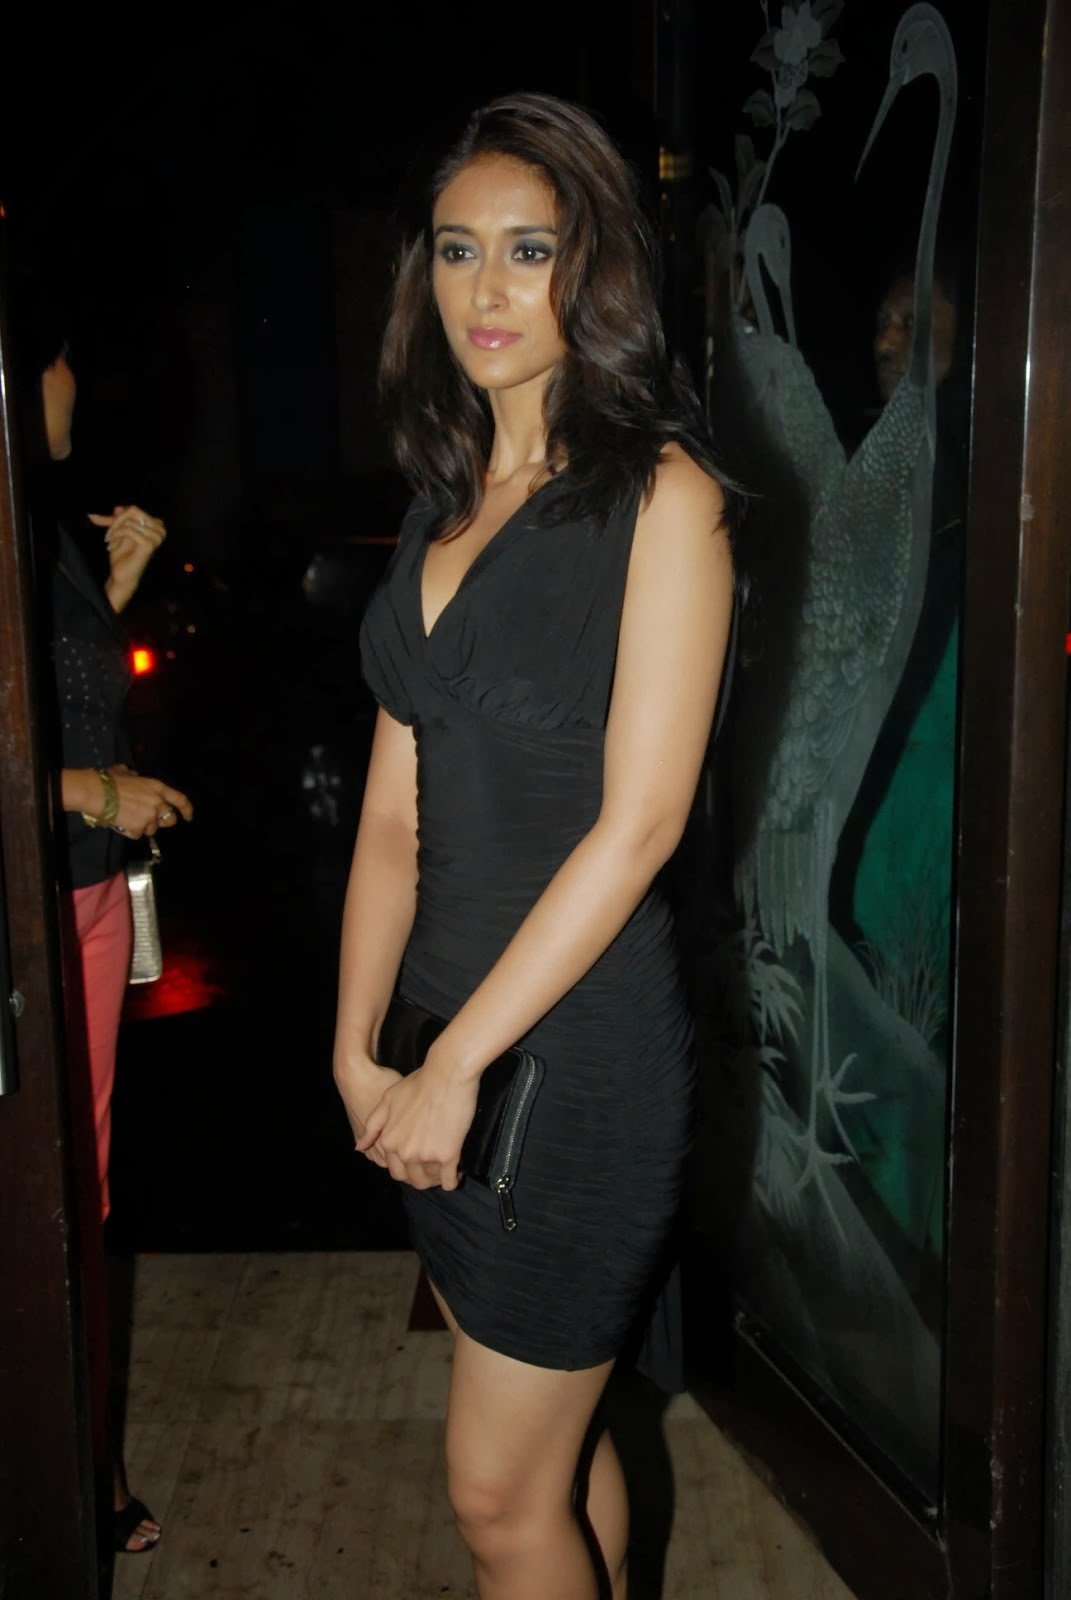 Hot photos in black short dress at phata poster nikla hero movie